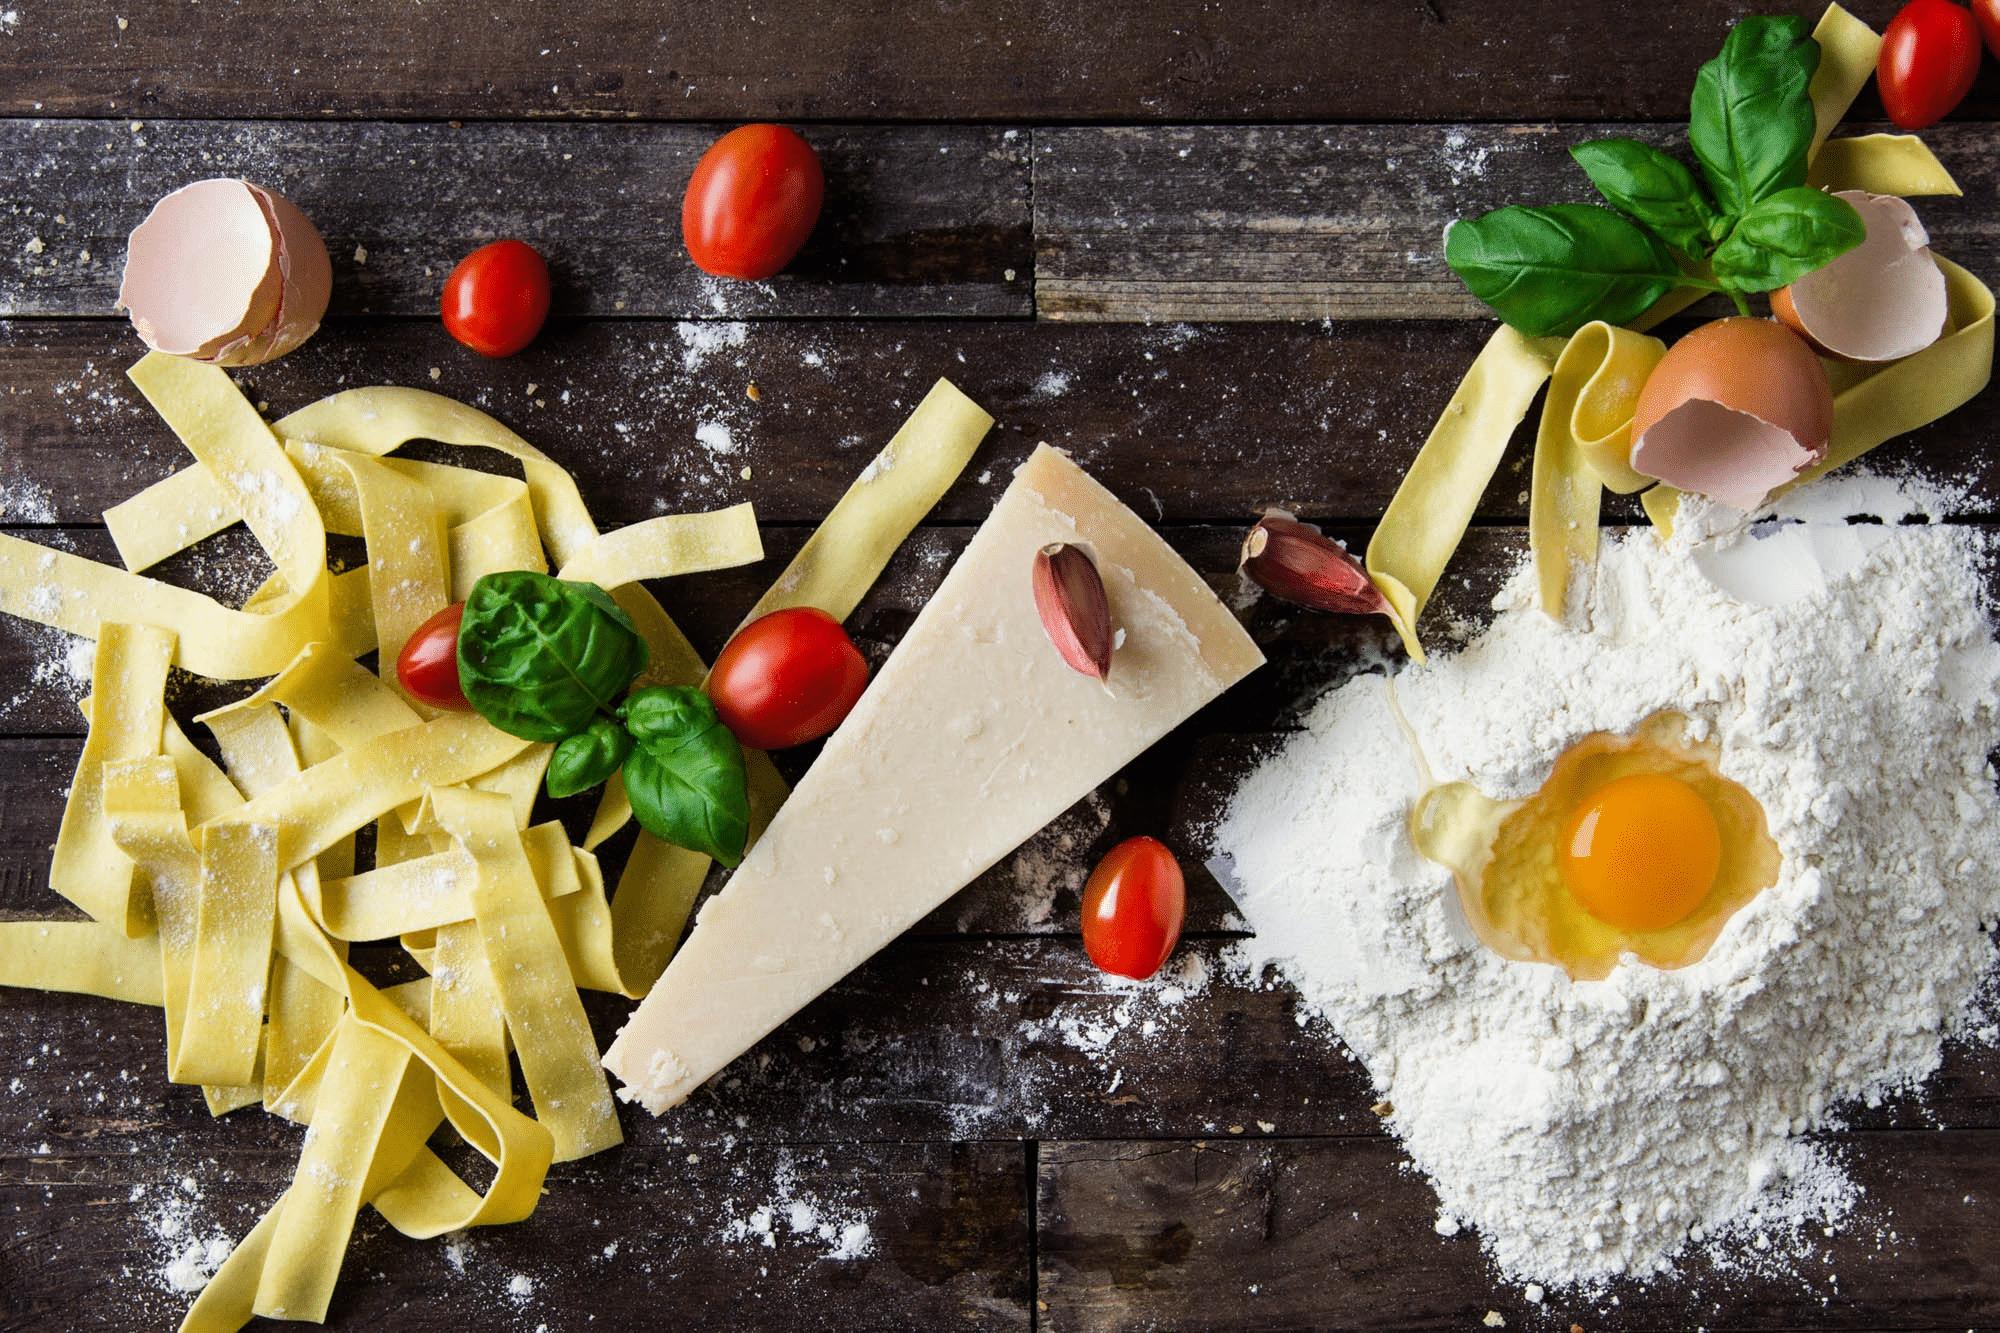 italian food in kenosha, casa capri, kenosha italian food